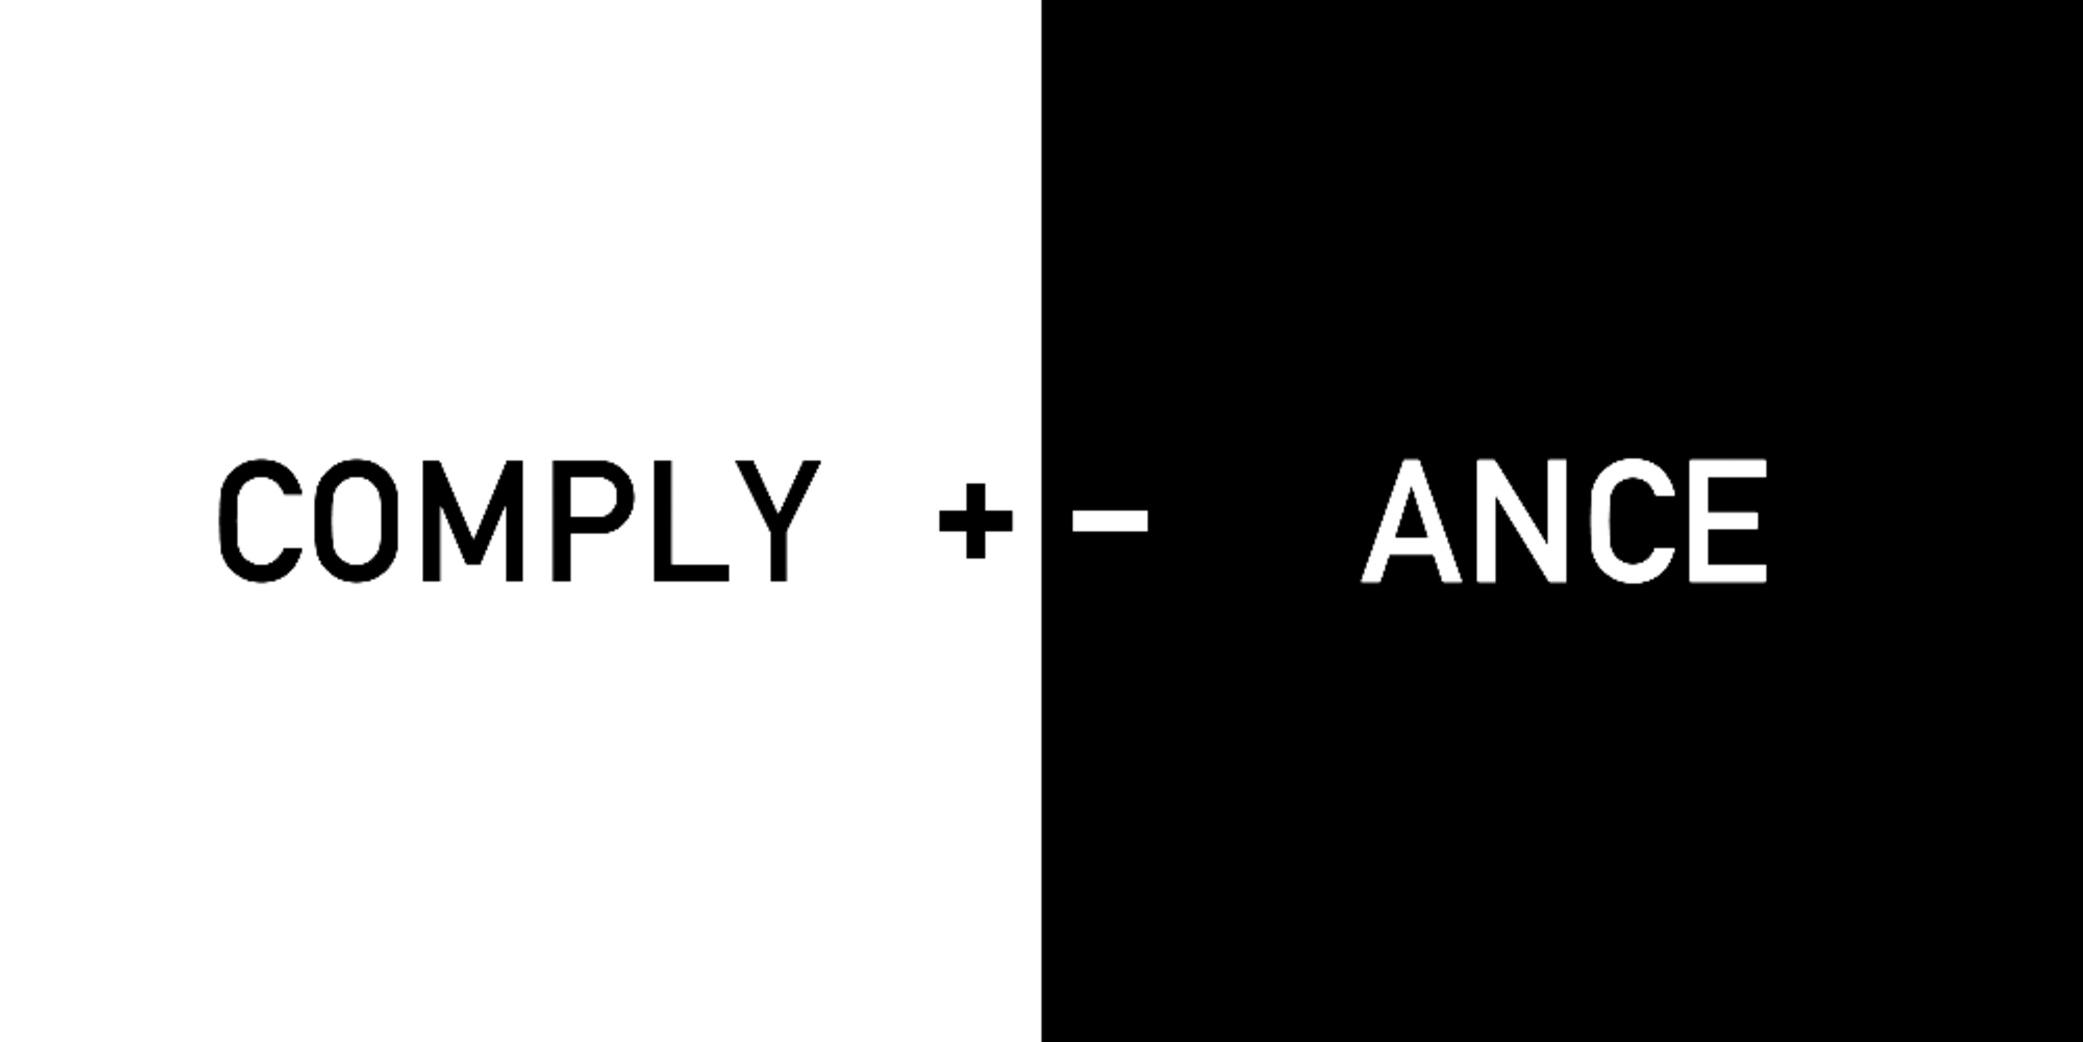 2月21日(金) <br>映画「COMPLY+- ANCE」本日公開!!